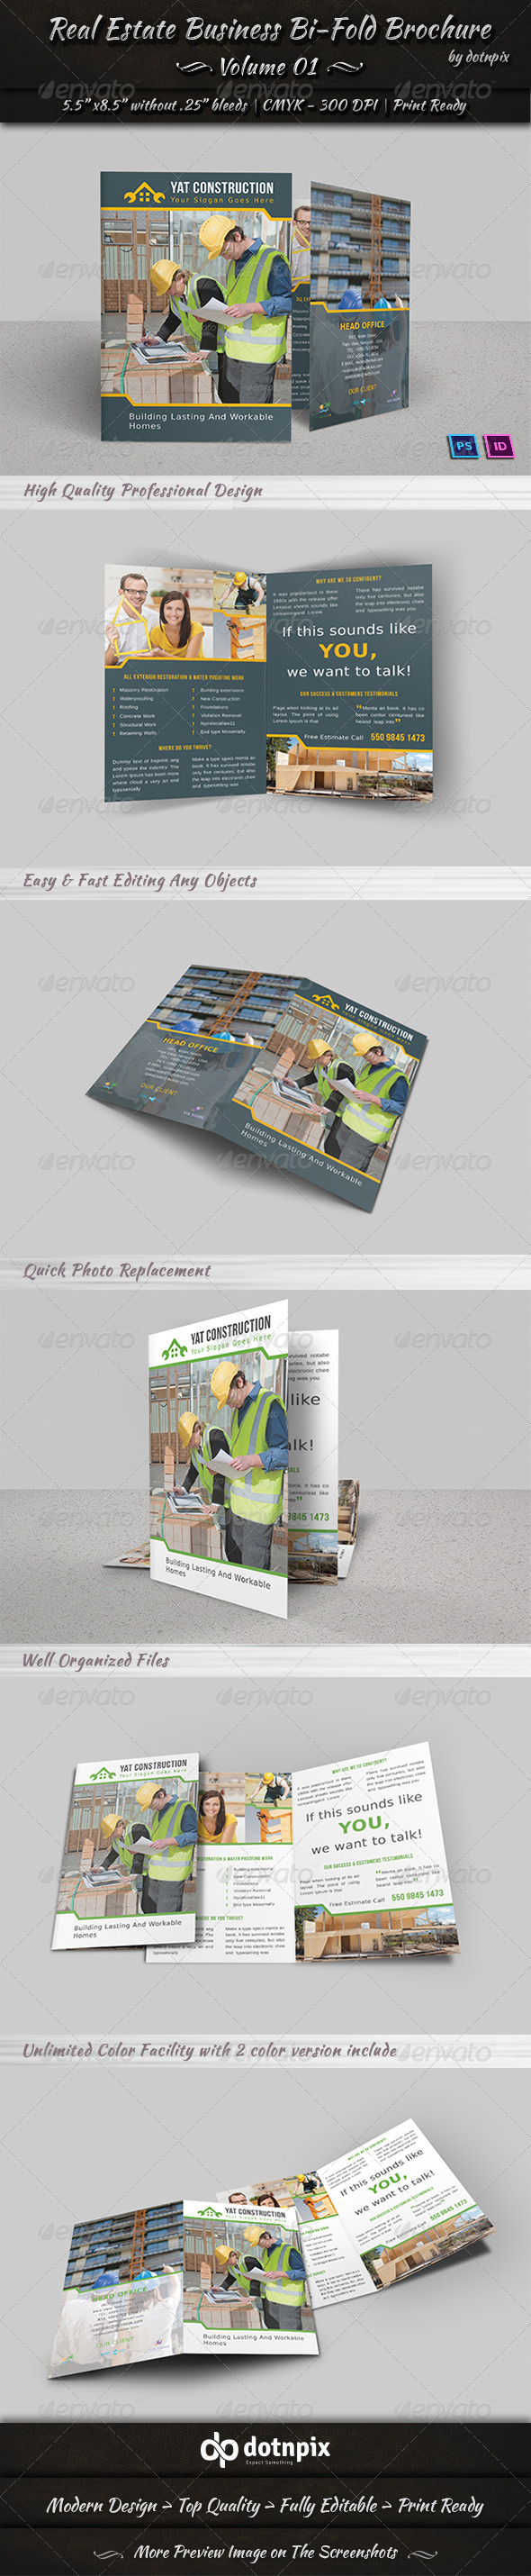 GraphicRiver Real Estate Business Bi-Fold Brochure Volume 1 7191912